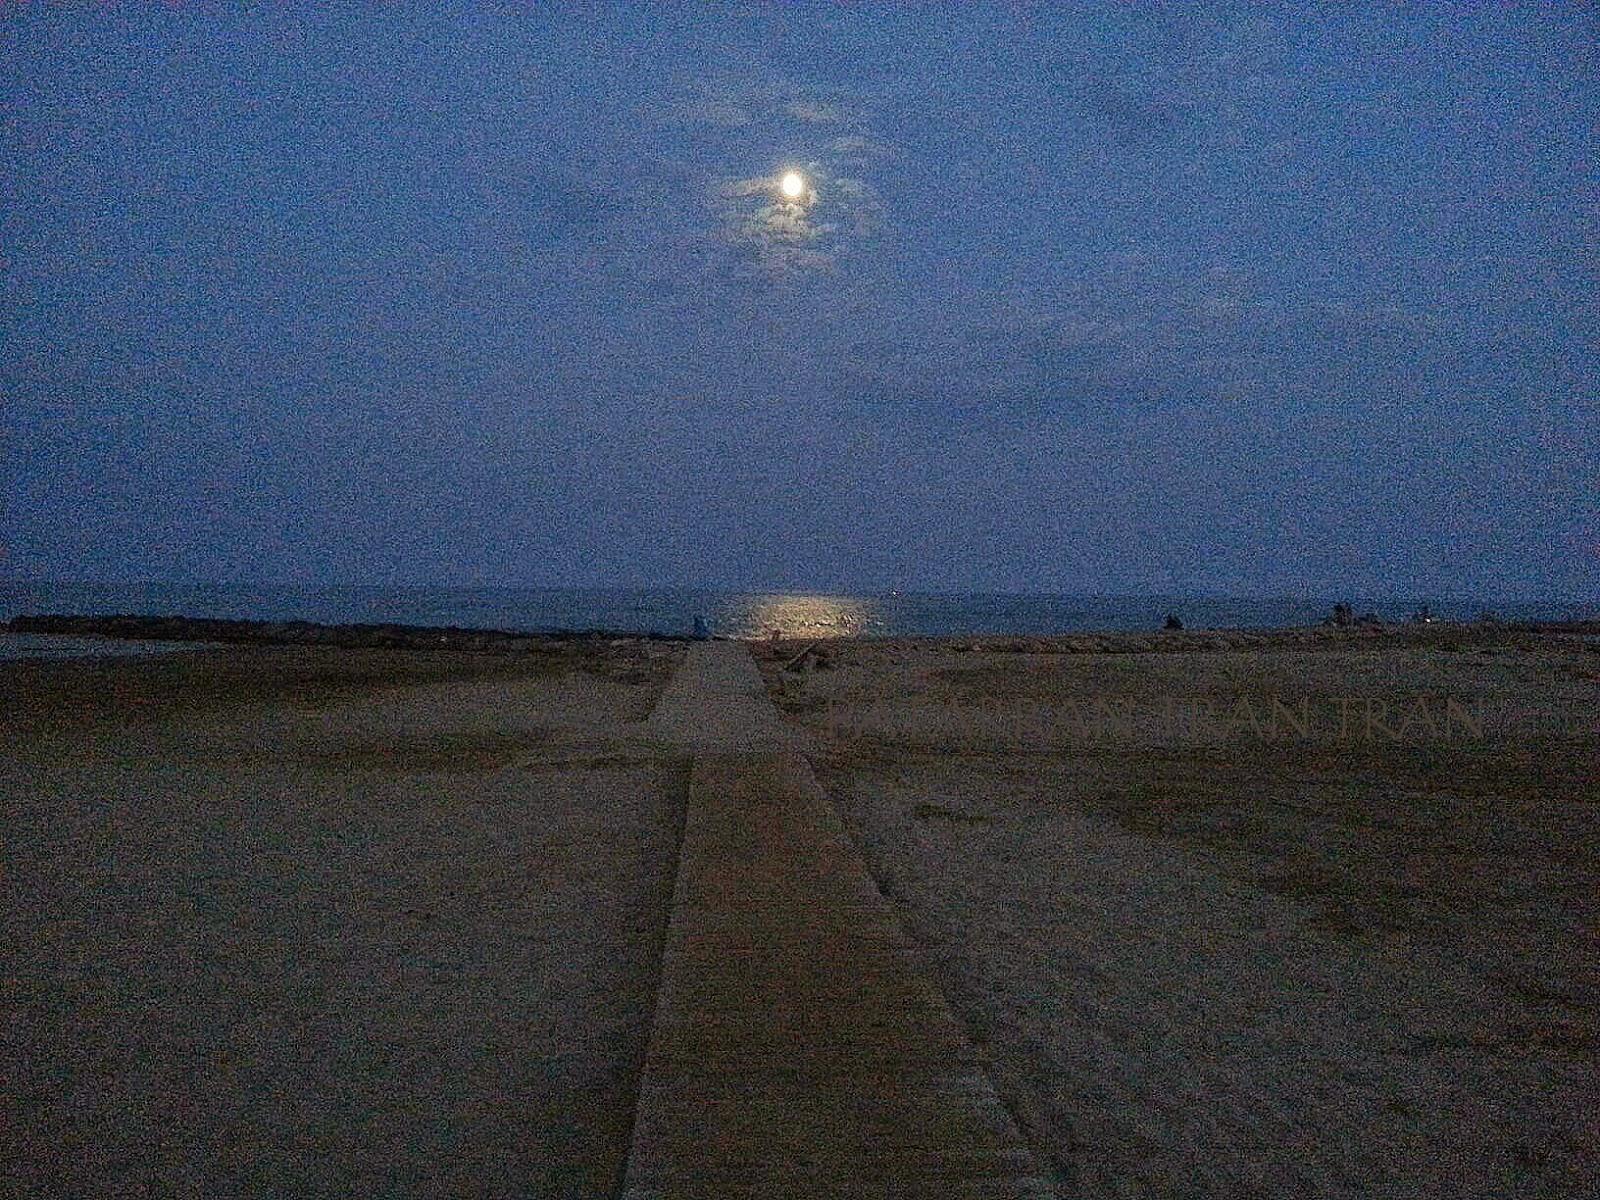 anochecer paseo Bernat Artola. Blessed Summer. Benicassim.